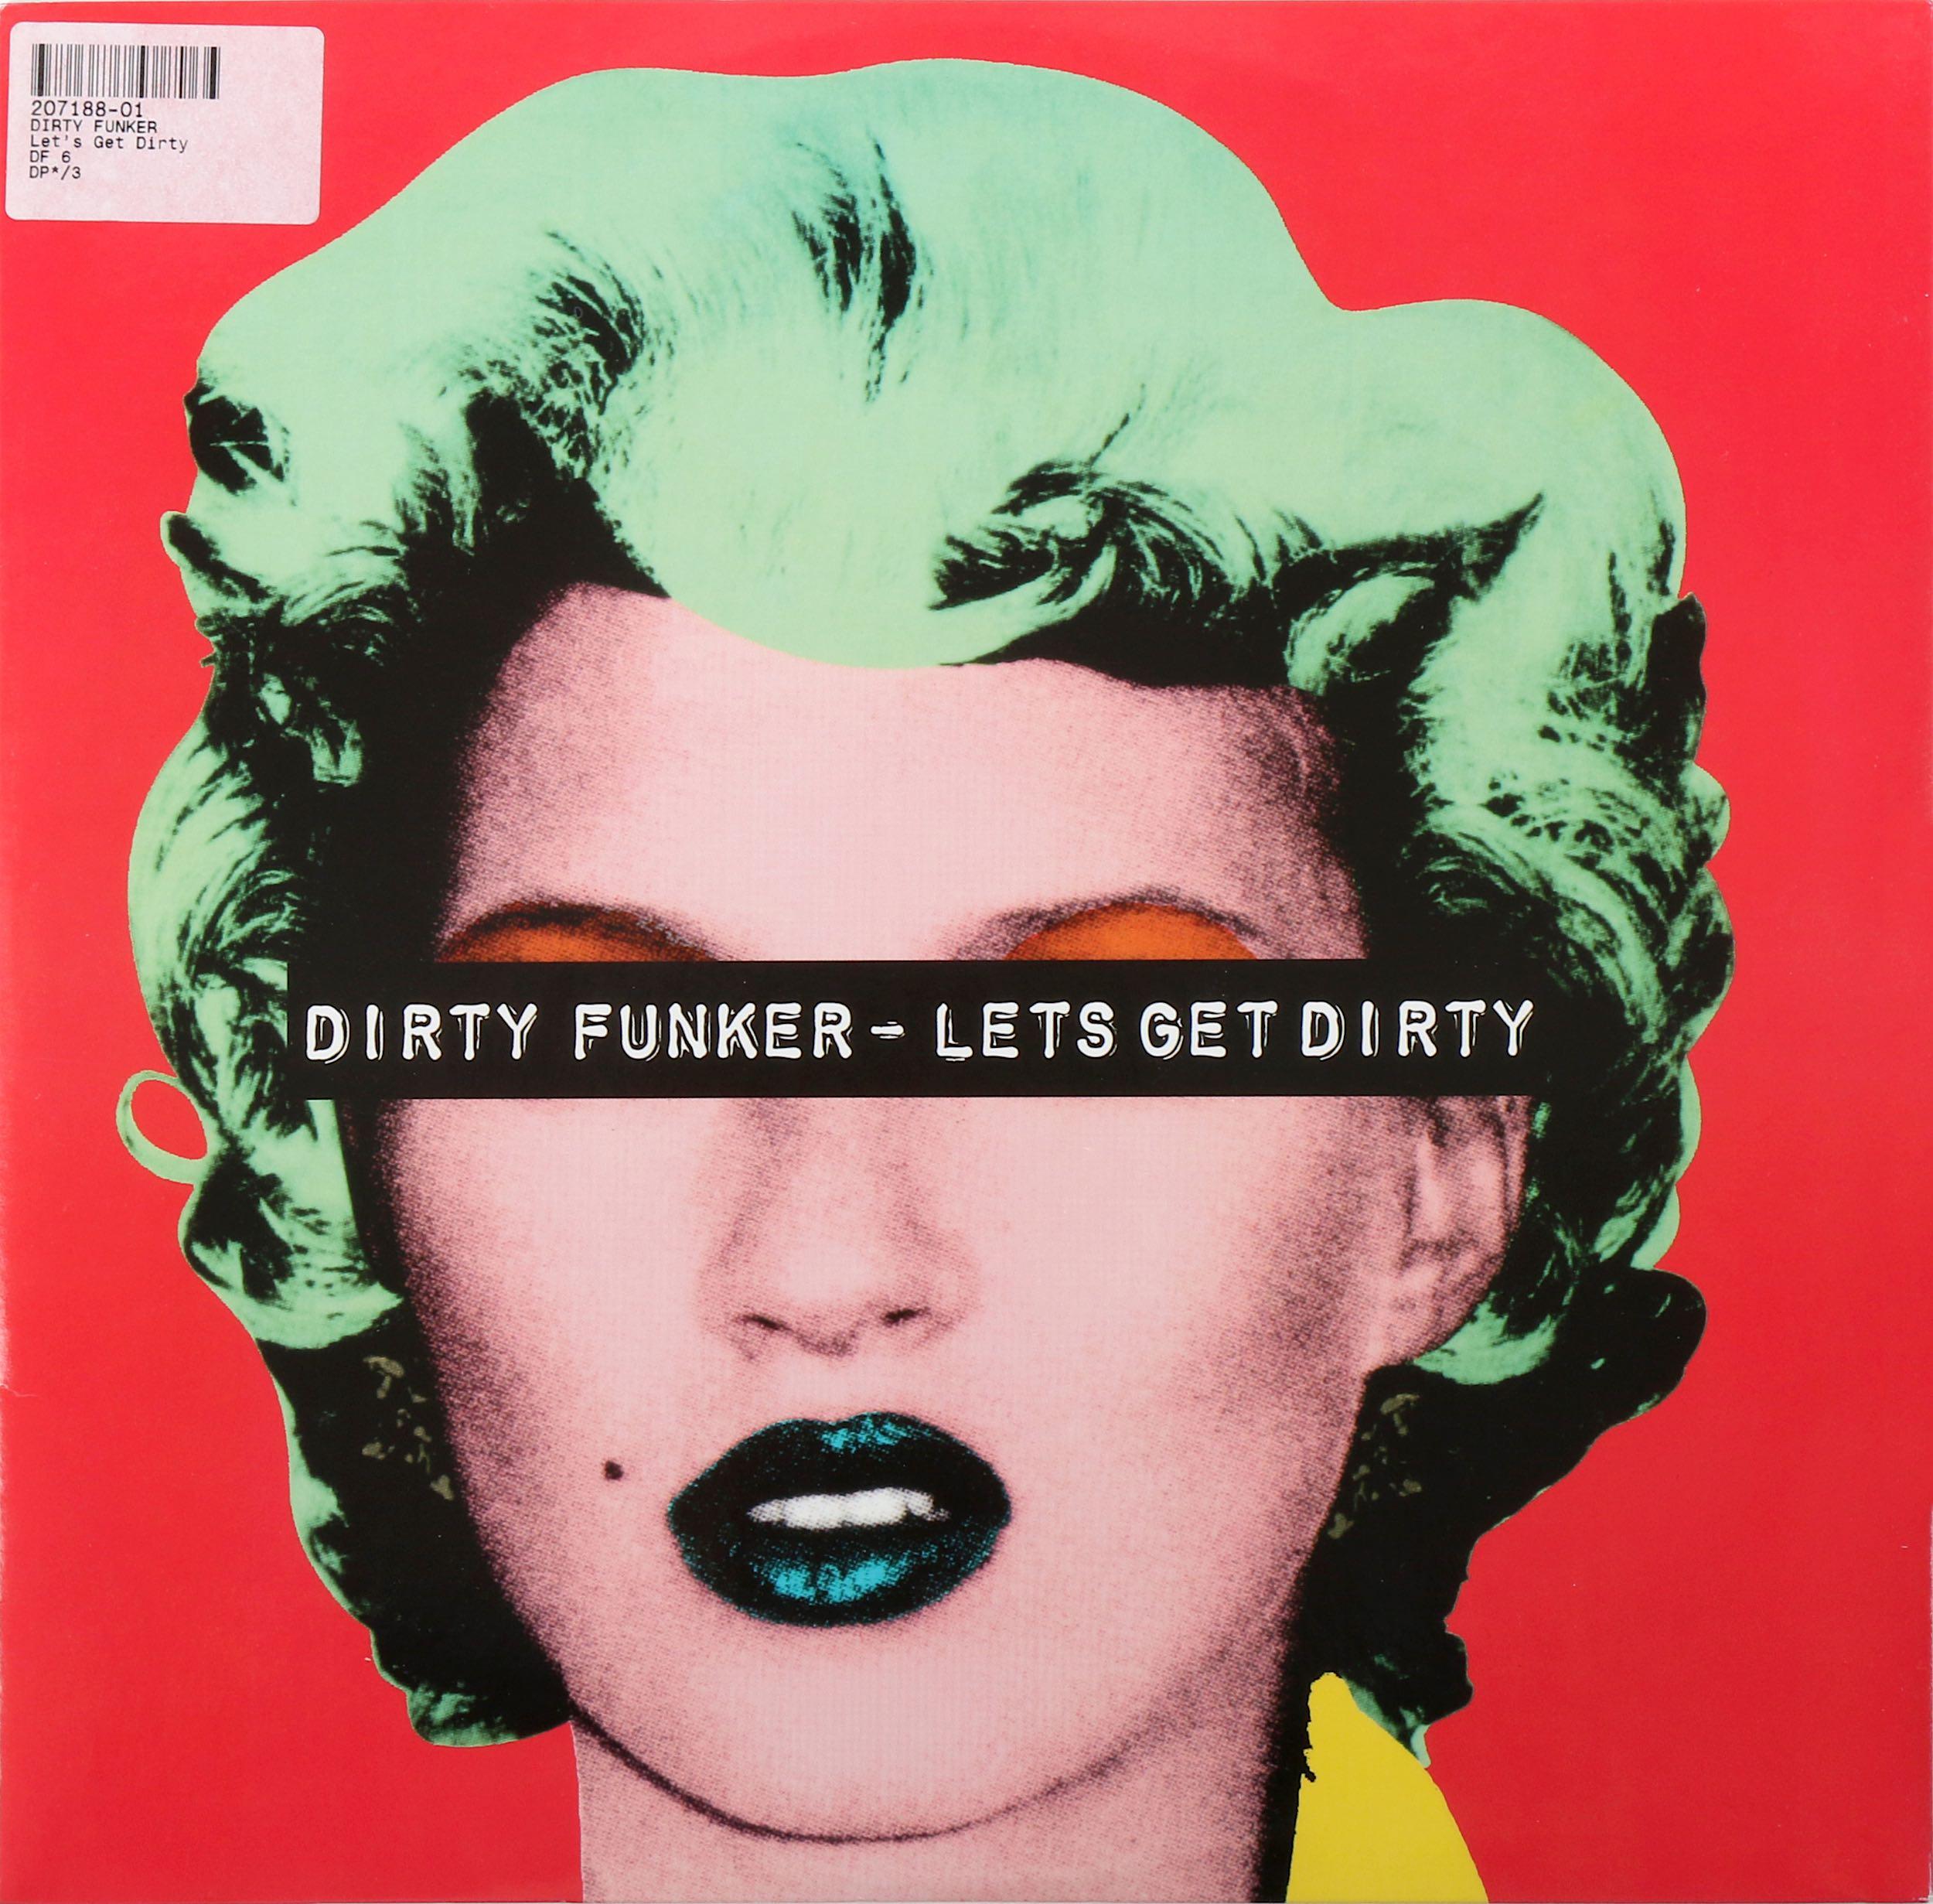 Lot 351 - Banksy (British b.1974), 'Dirty Funker - Let's Get Dirty', 2006